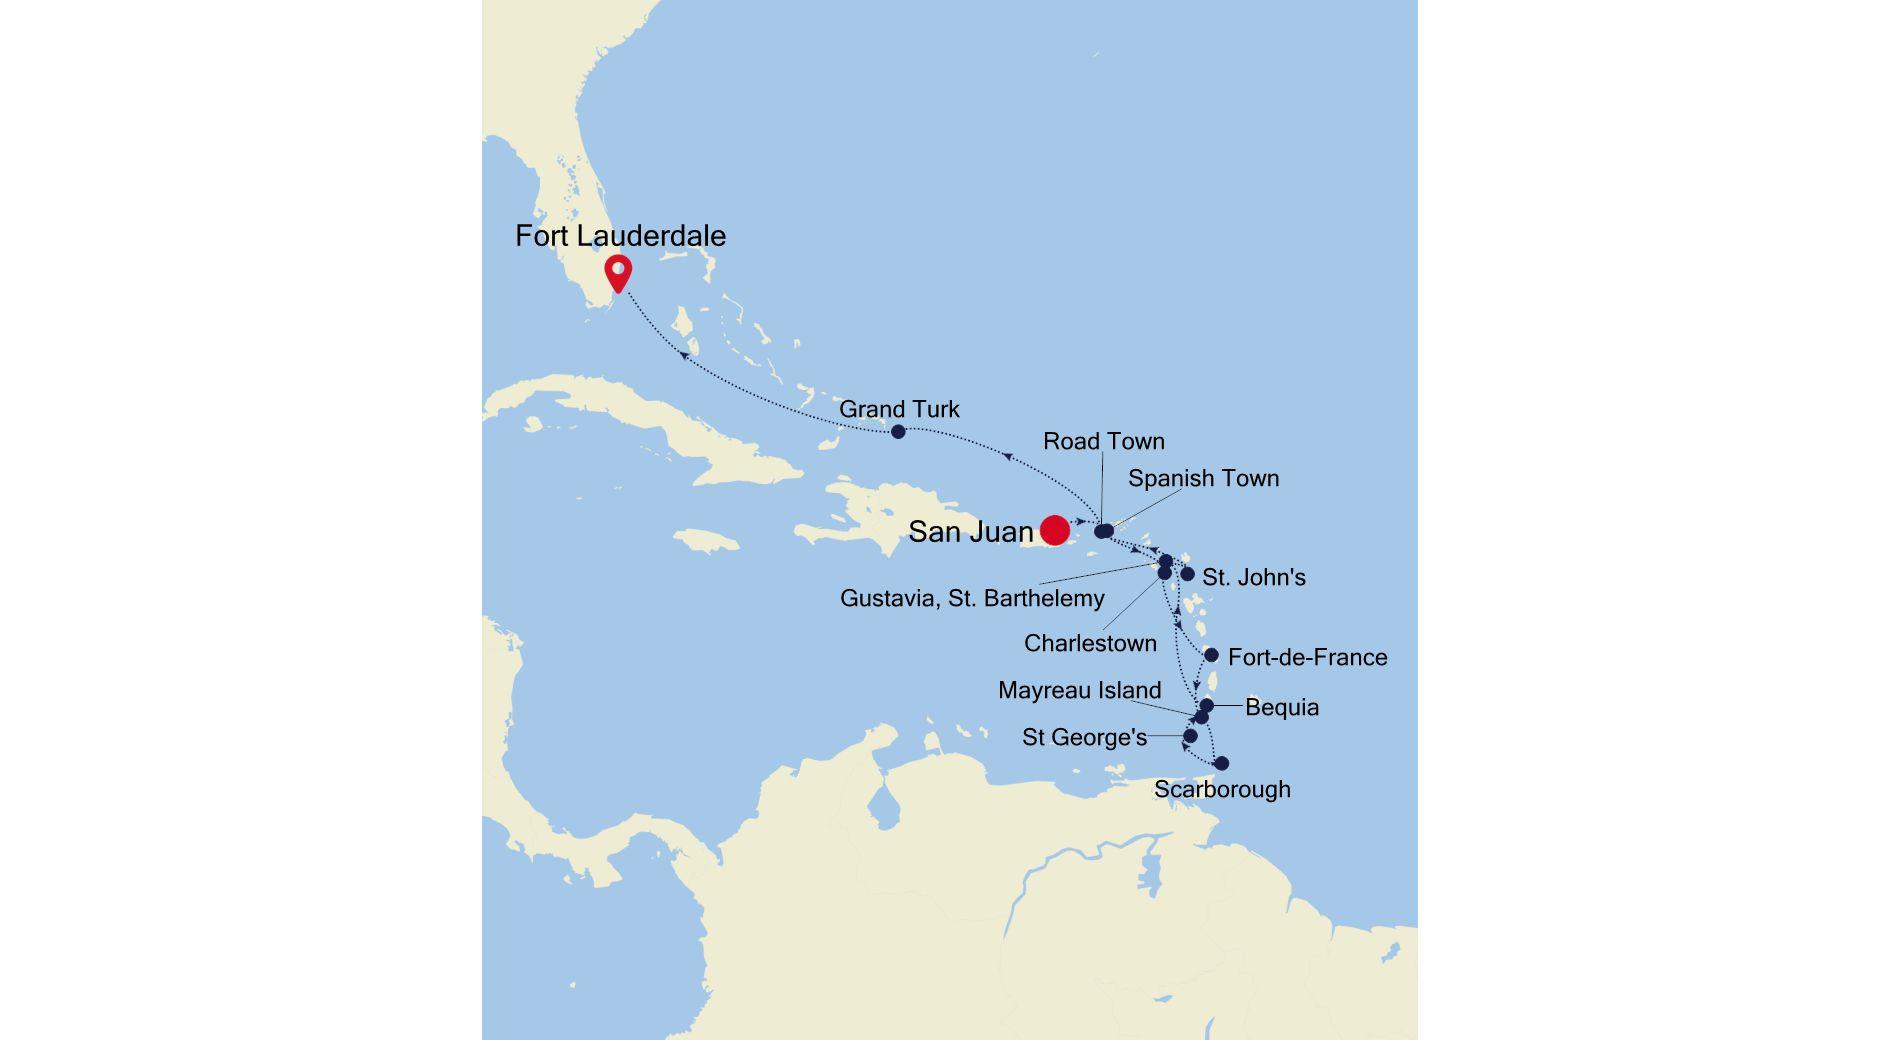 SS201204014 - San Juan to Fort Lauderdale